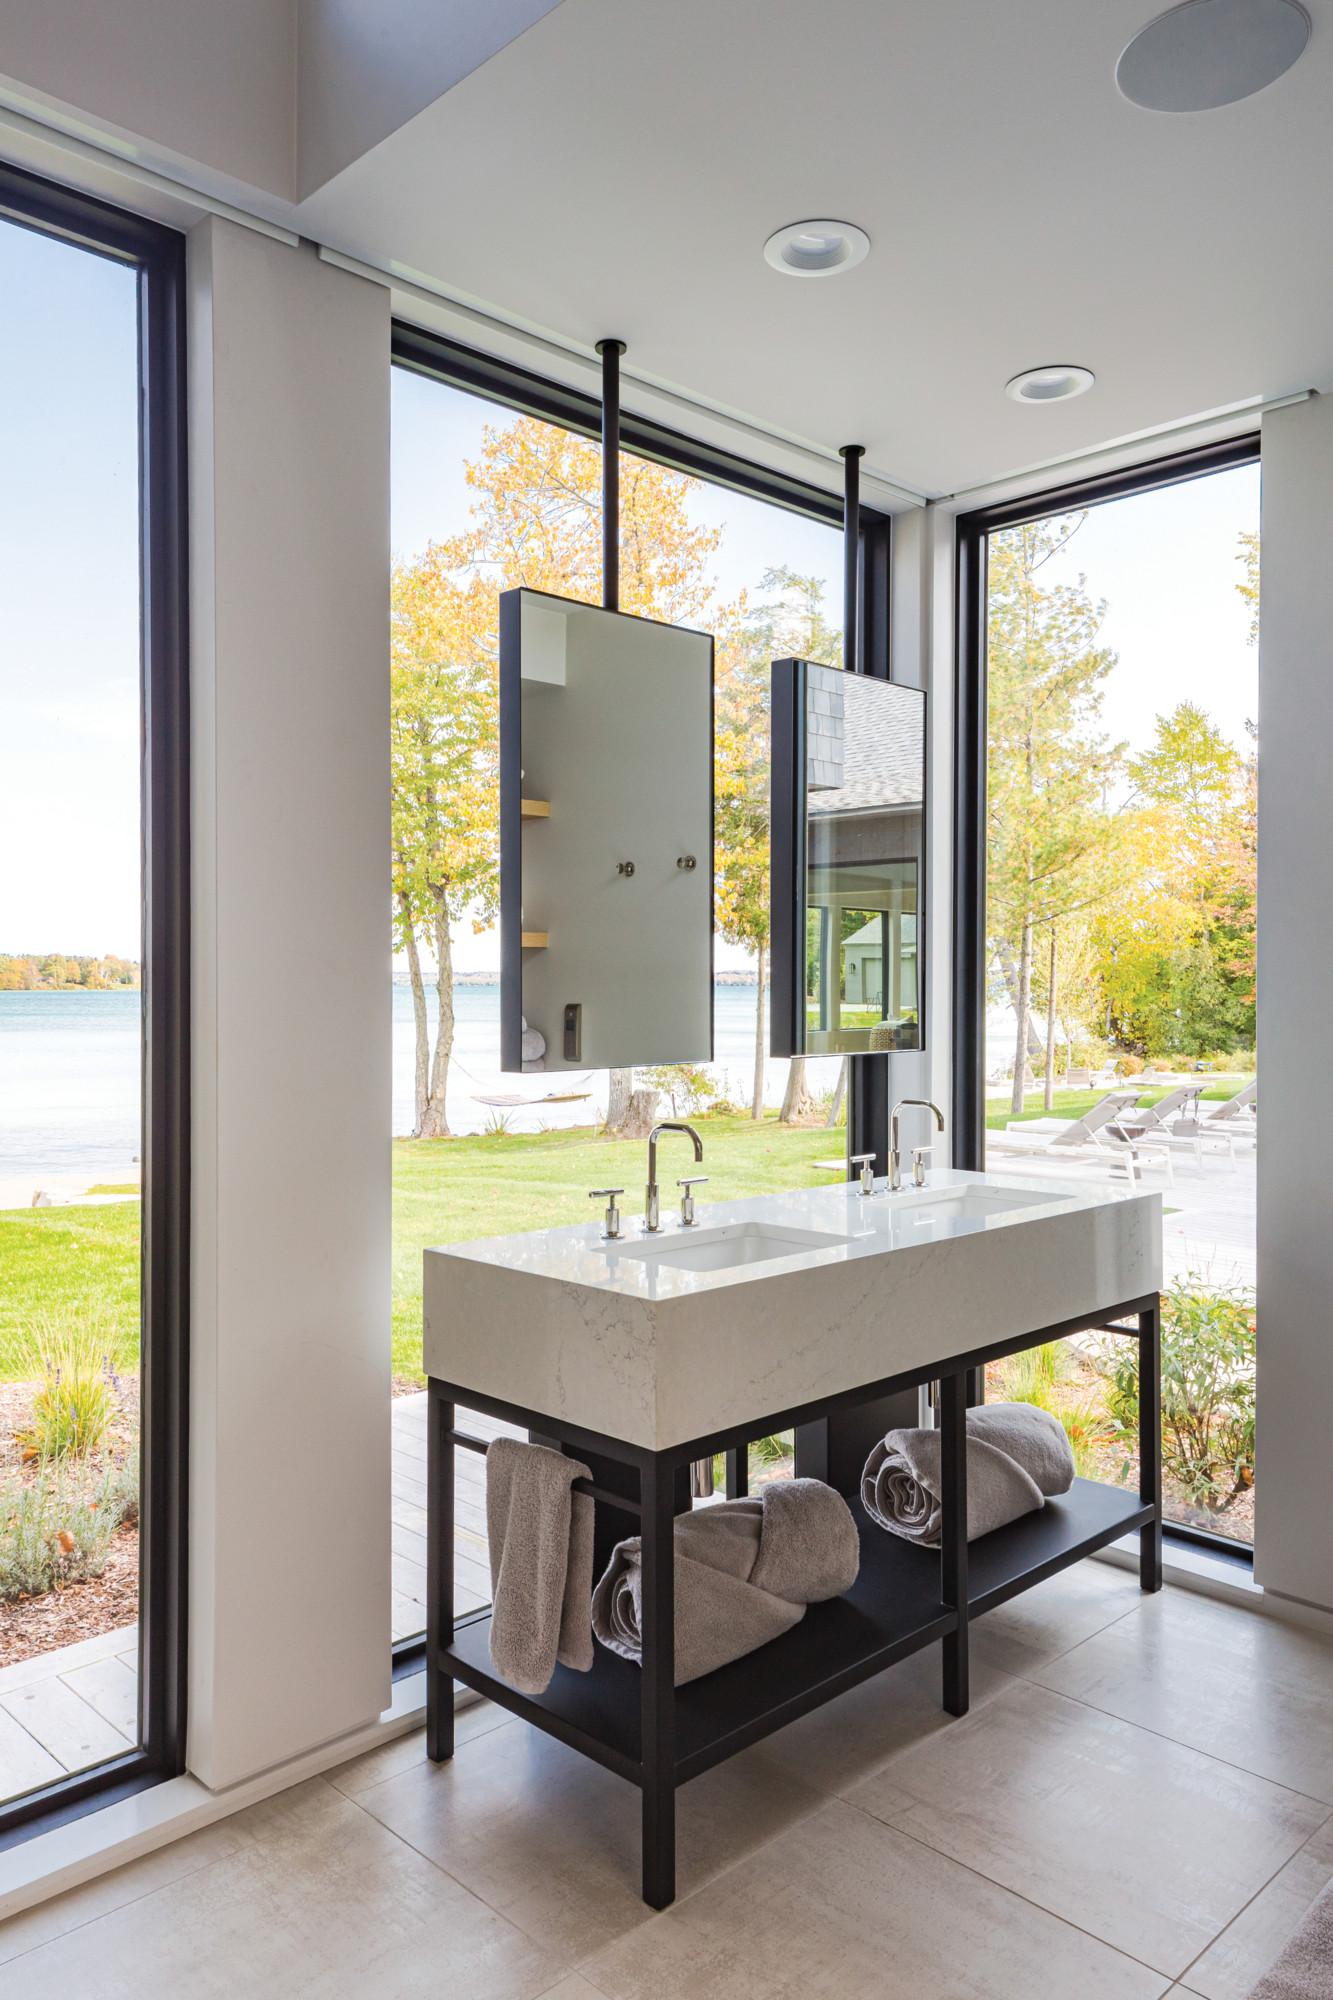 Bathroom of a Northern Michigan cottage.